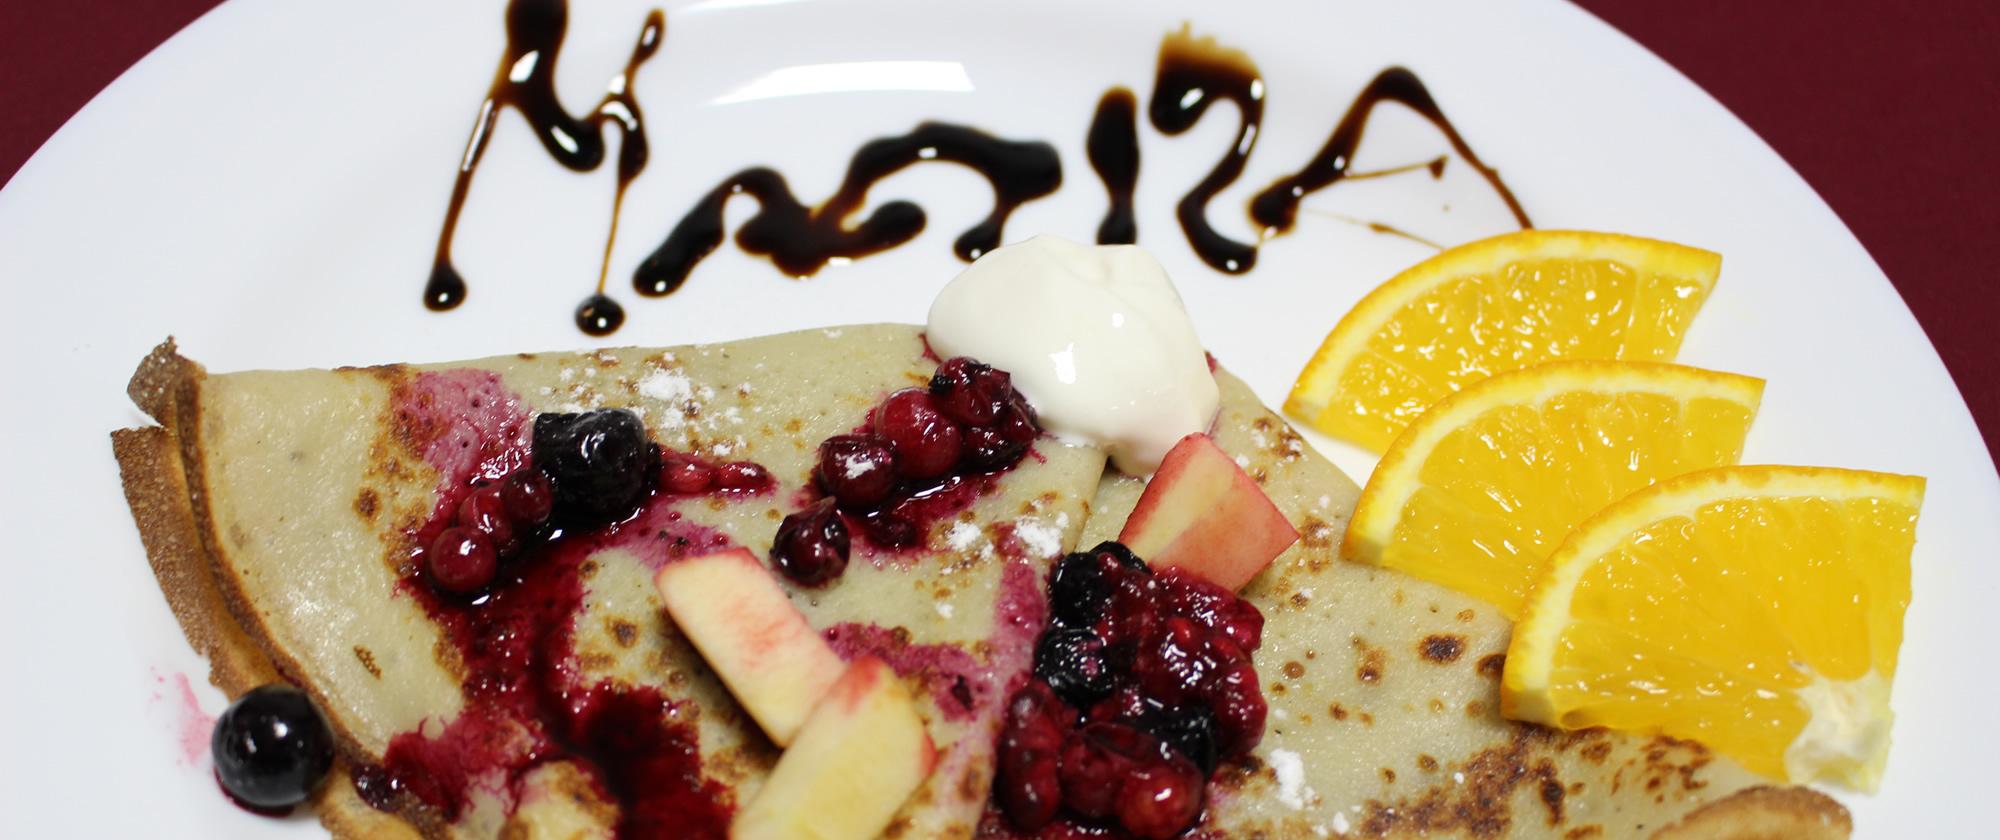 http://complexmagura.com/wp-content/uploads/2016/03/restaurant-pancake.jpg